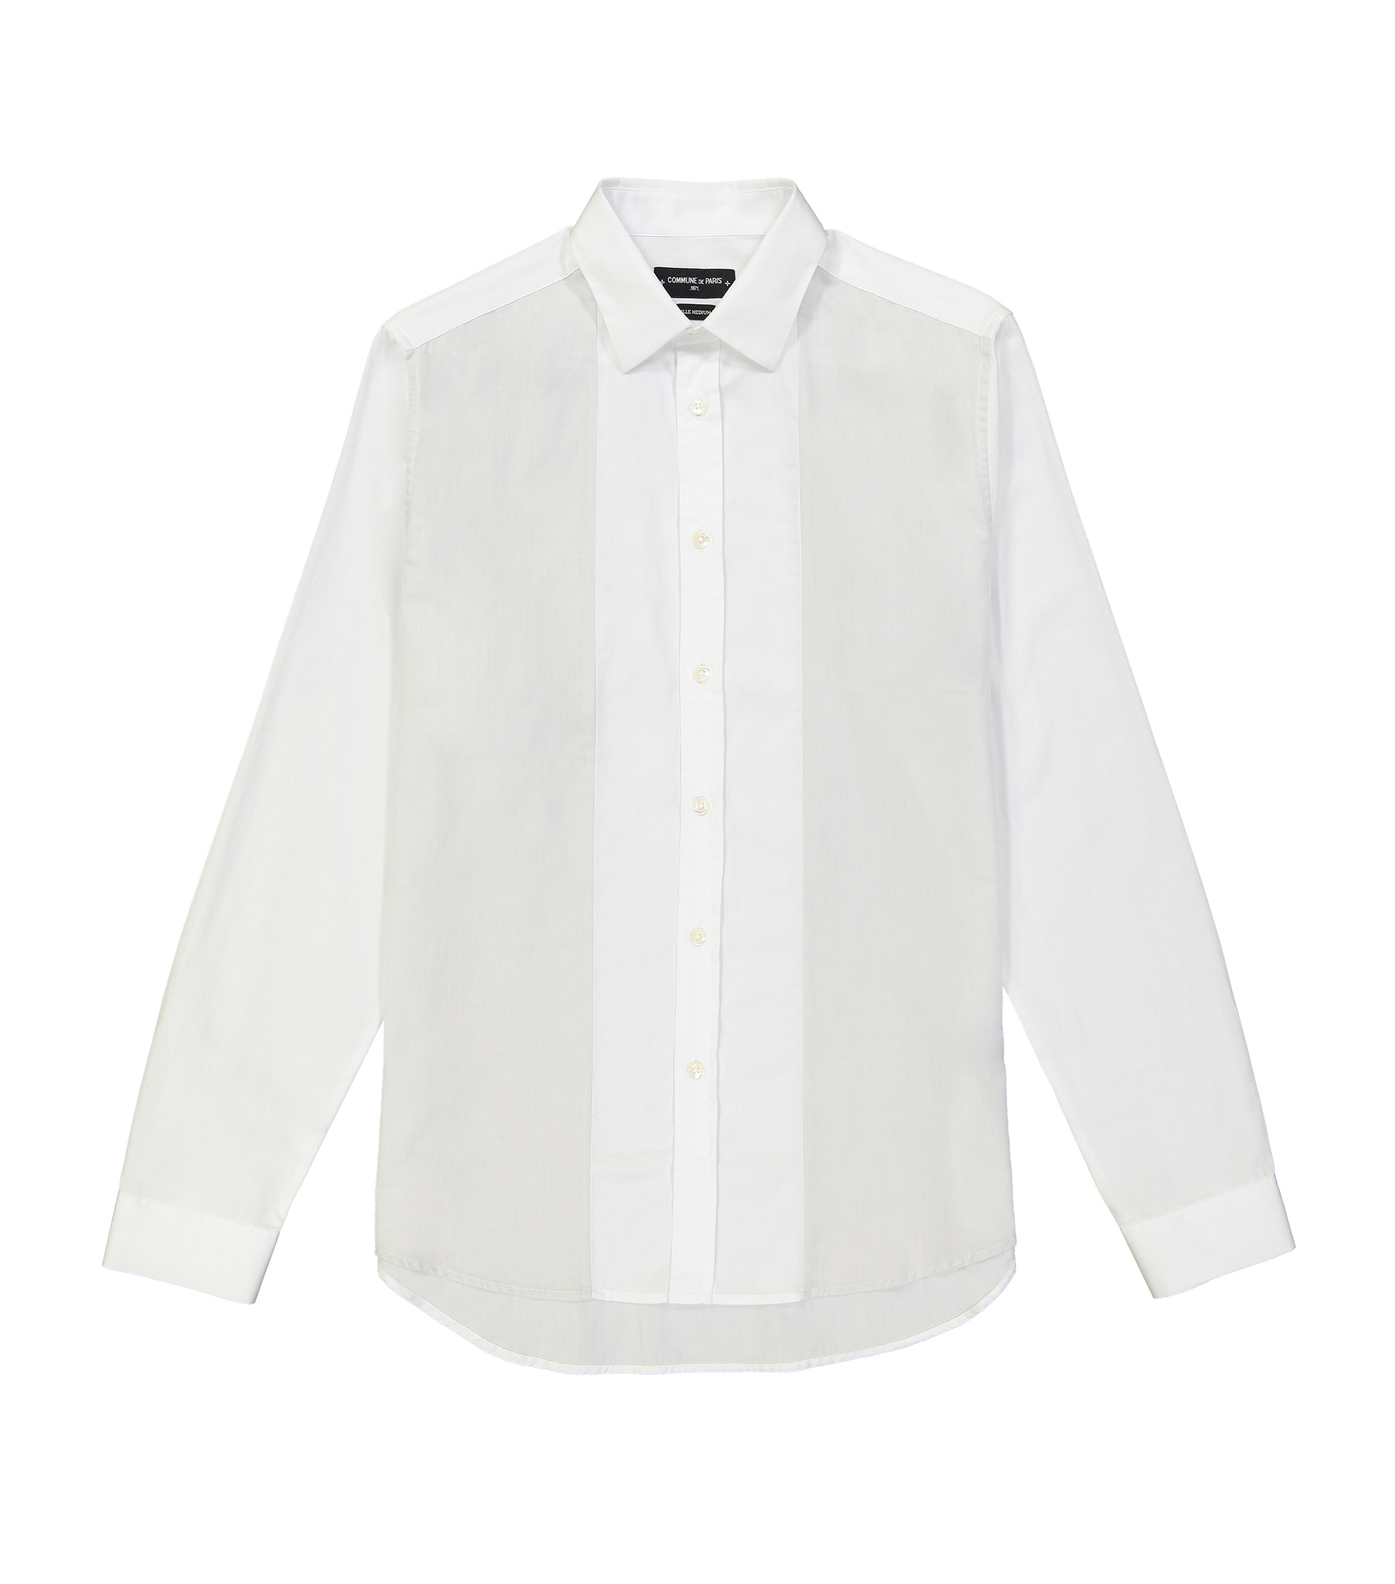 SHIRT AMAND  - White/grey